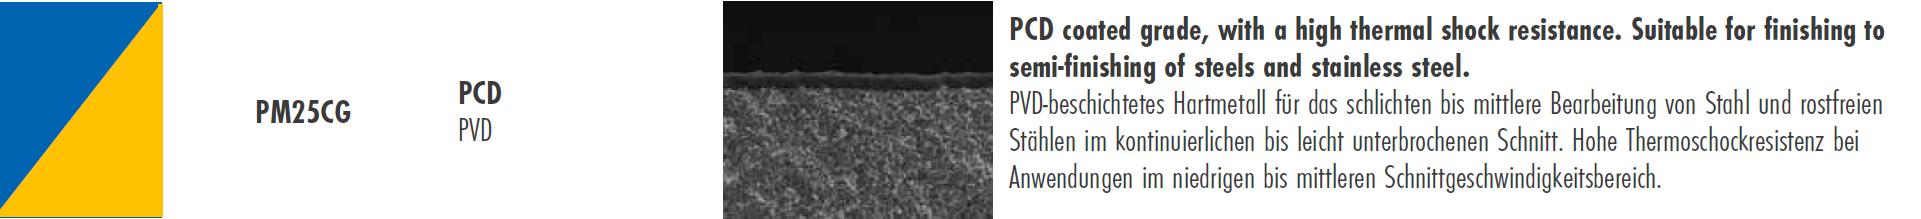 CCGT 060204 - PM3 - PM25CG für Stahl / VA